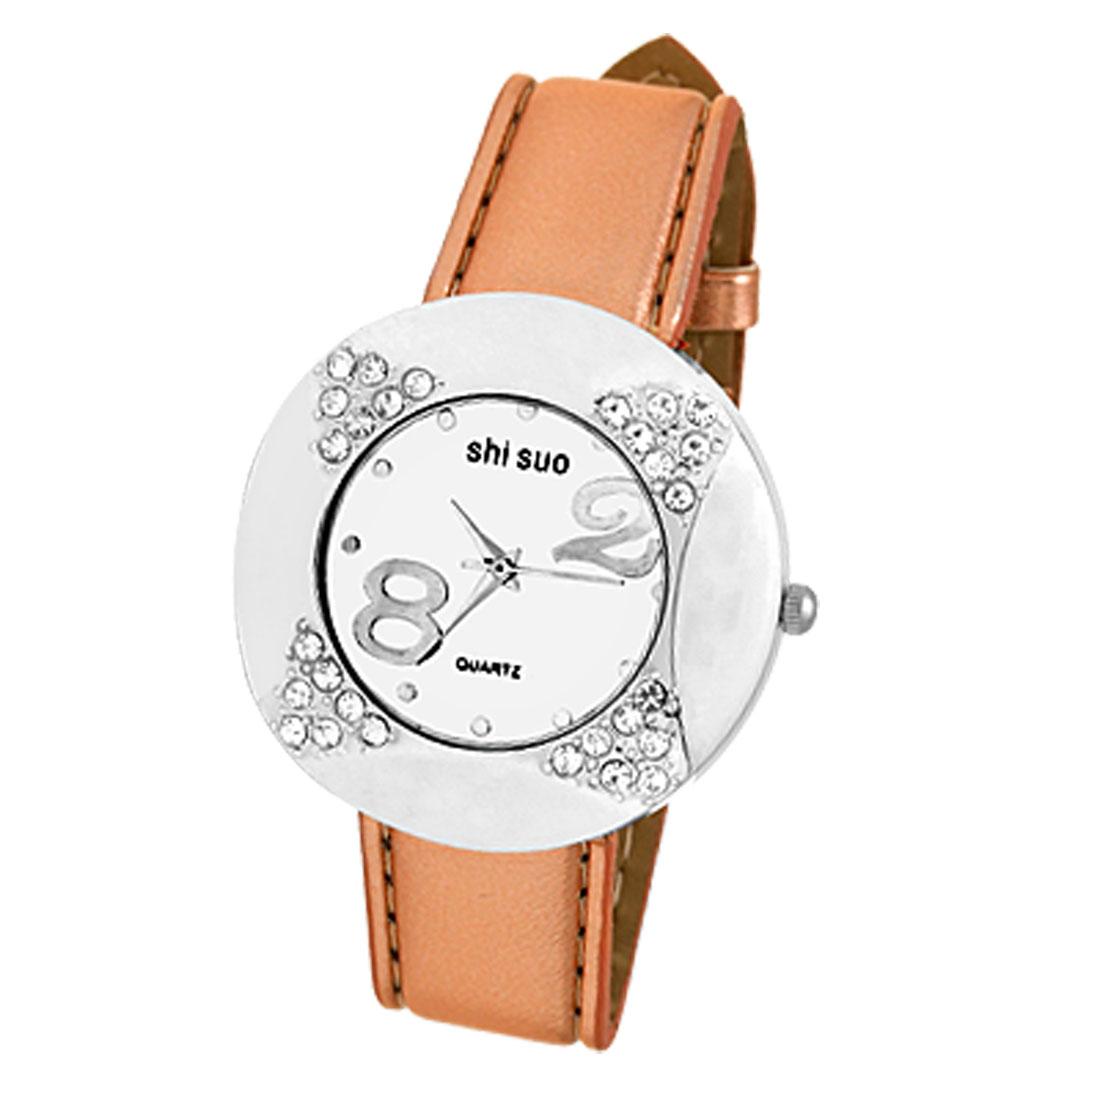 Fashion Leather Strap w/Rhinestone Watch Case Ladies' Watch